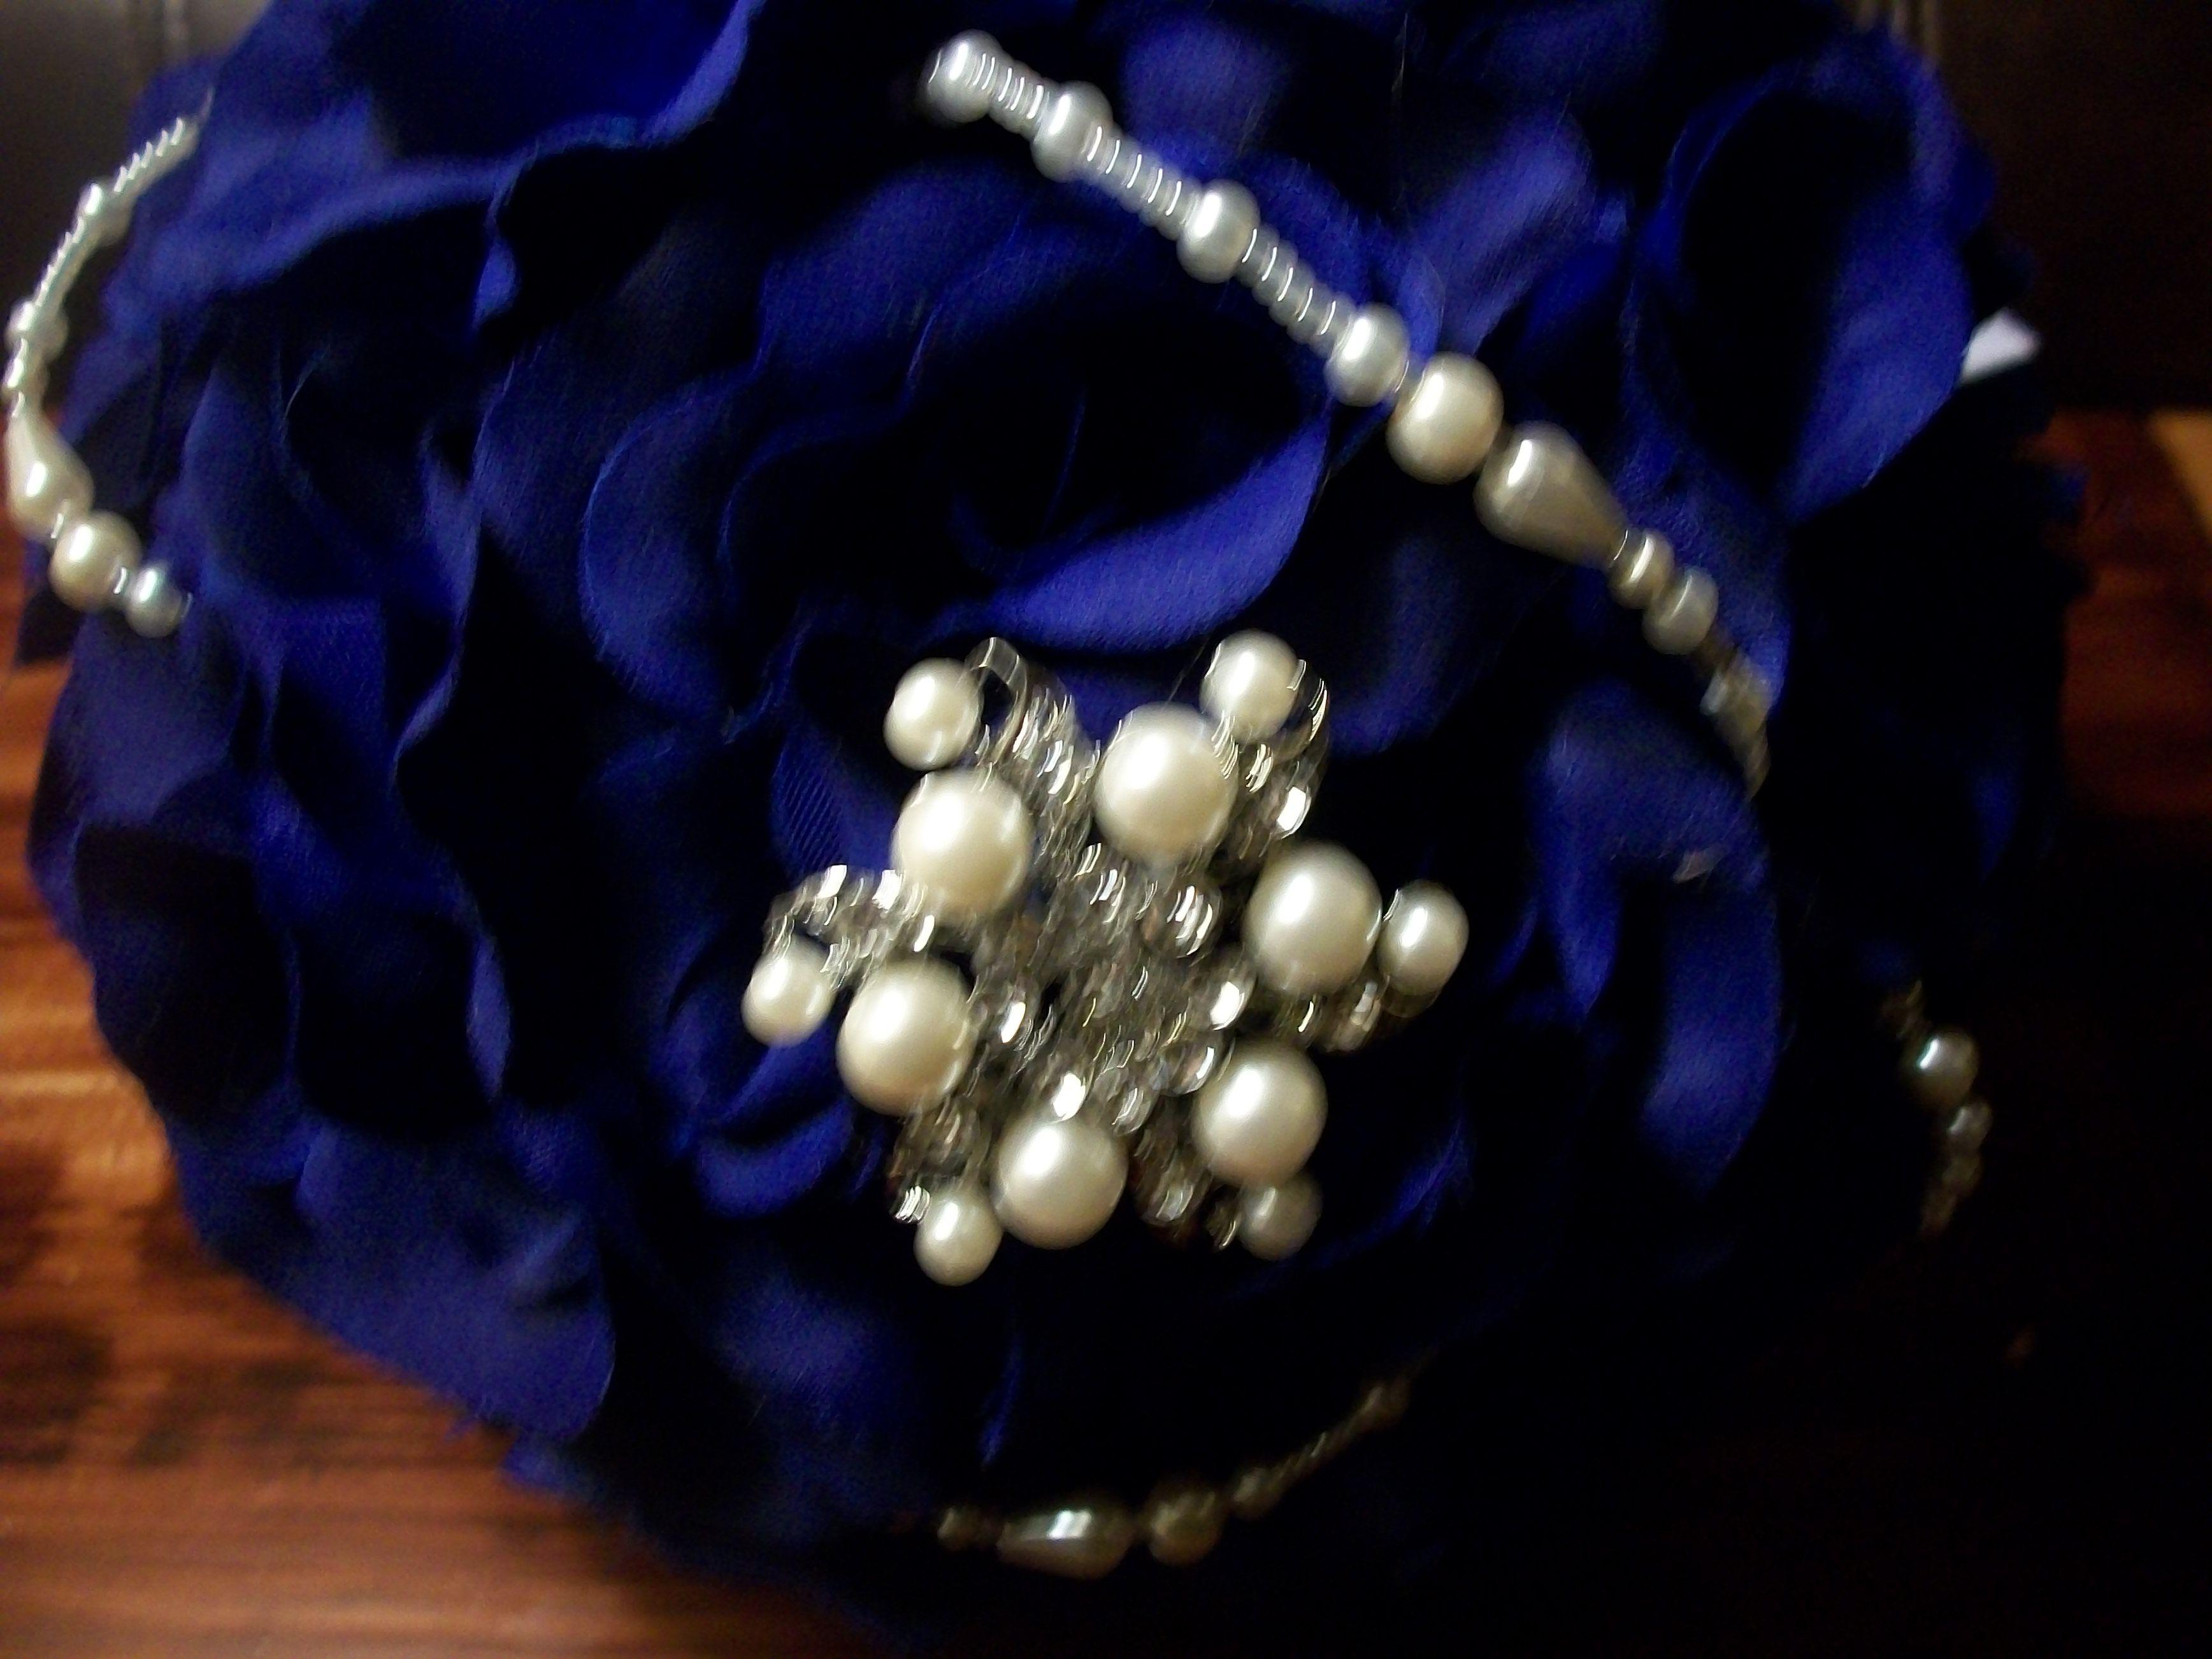 Pearls and brooch. MyGlorifiedLife